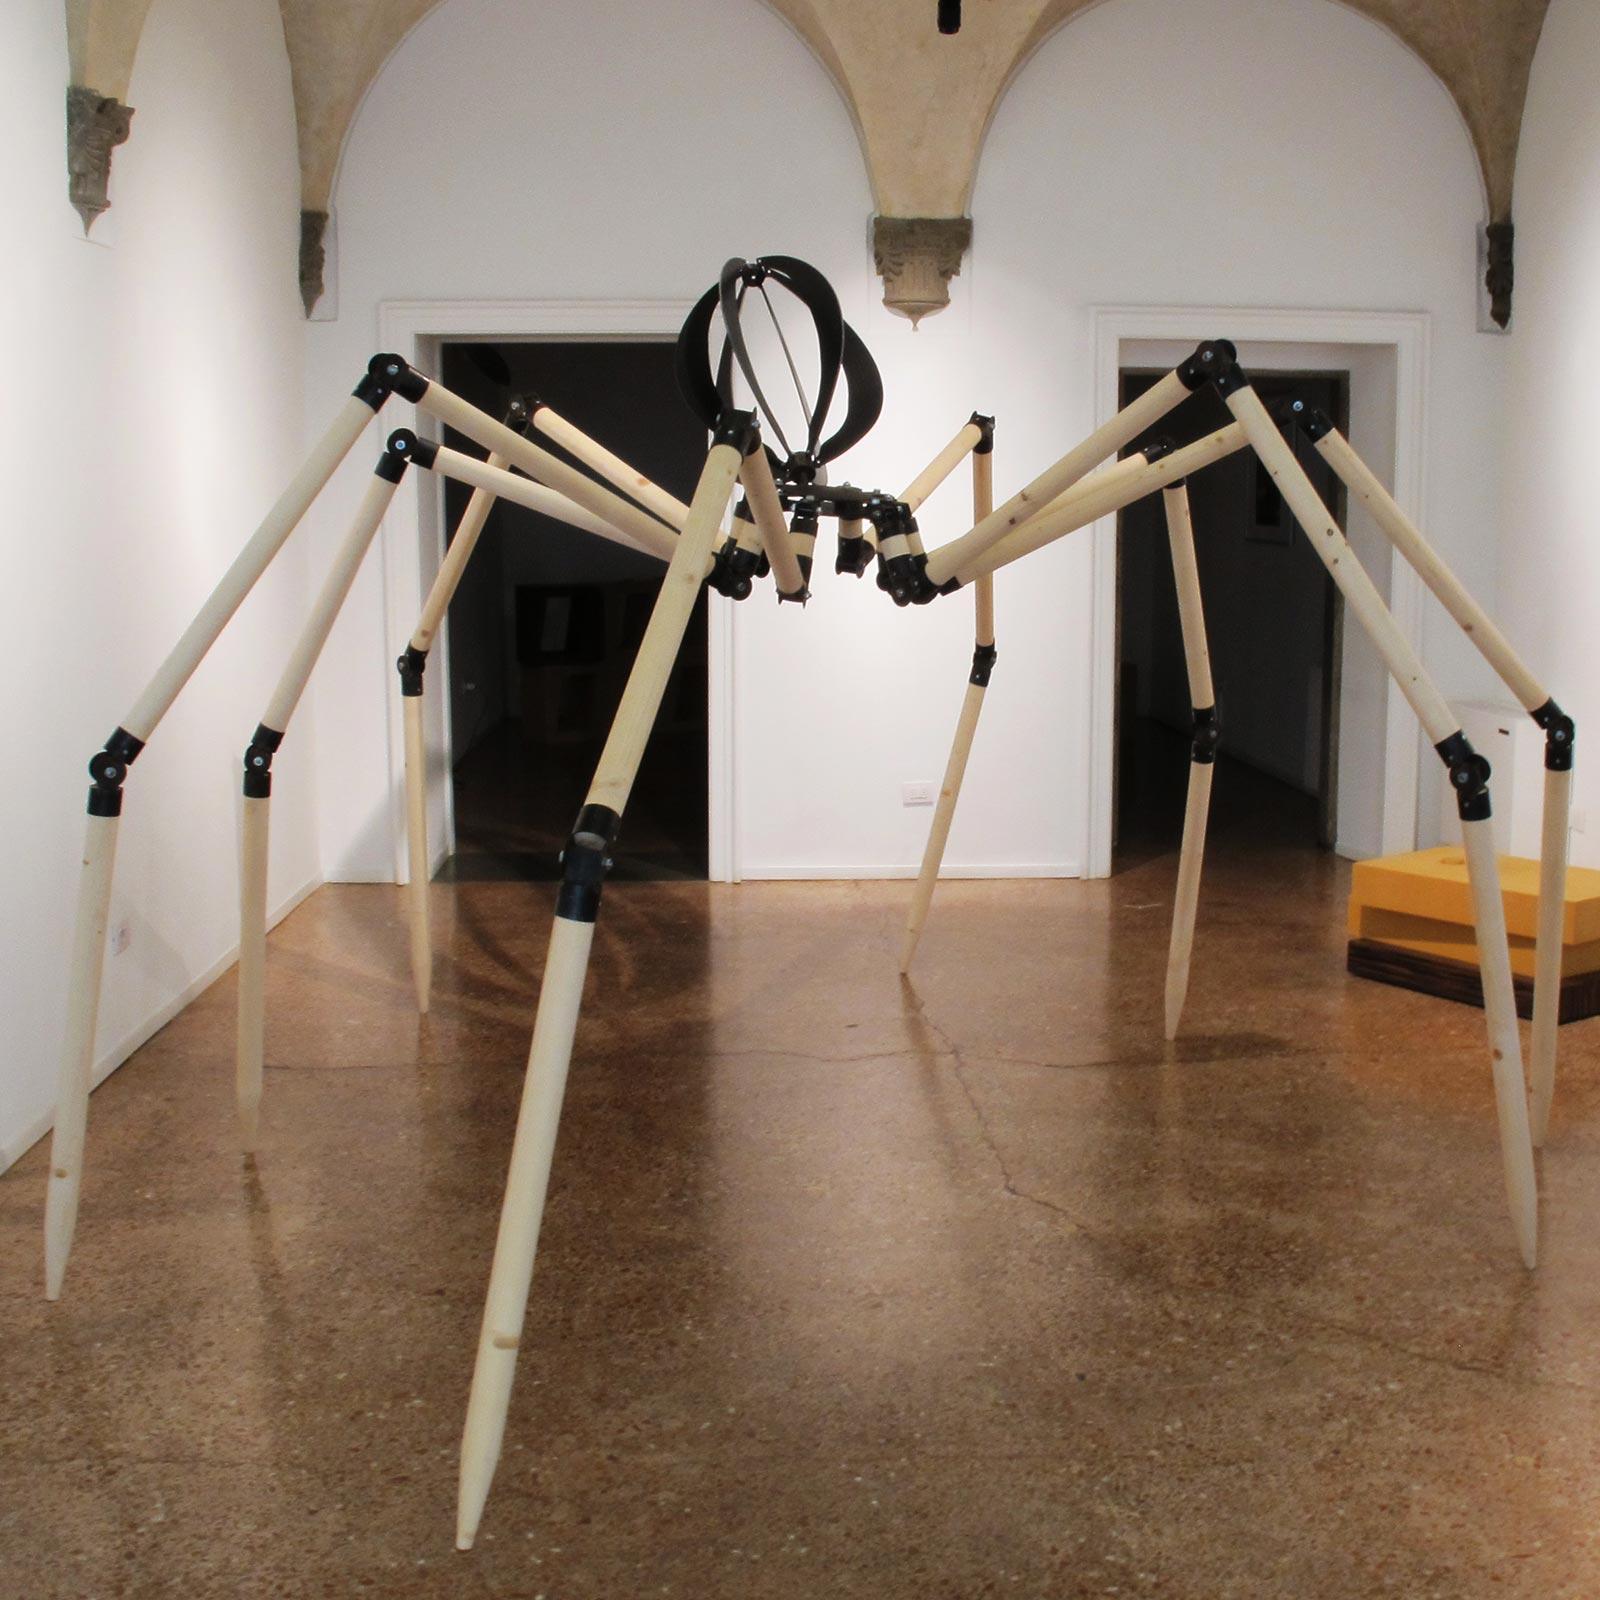 0-Gabriele-Mallegni,-Aracnide,-2012